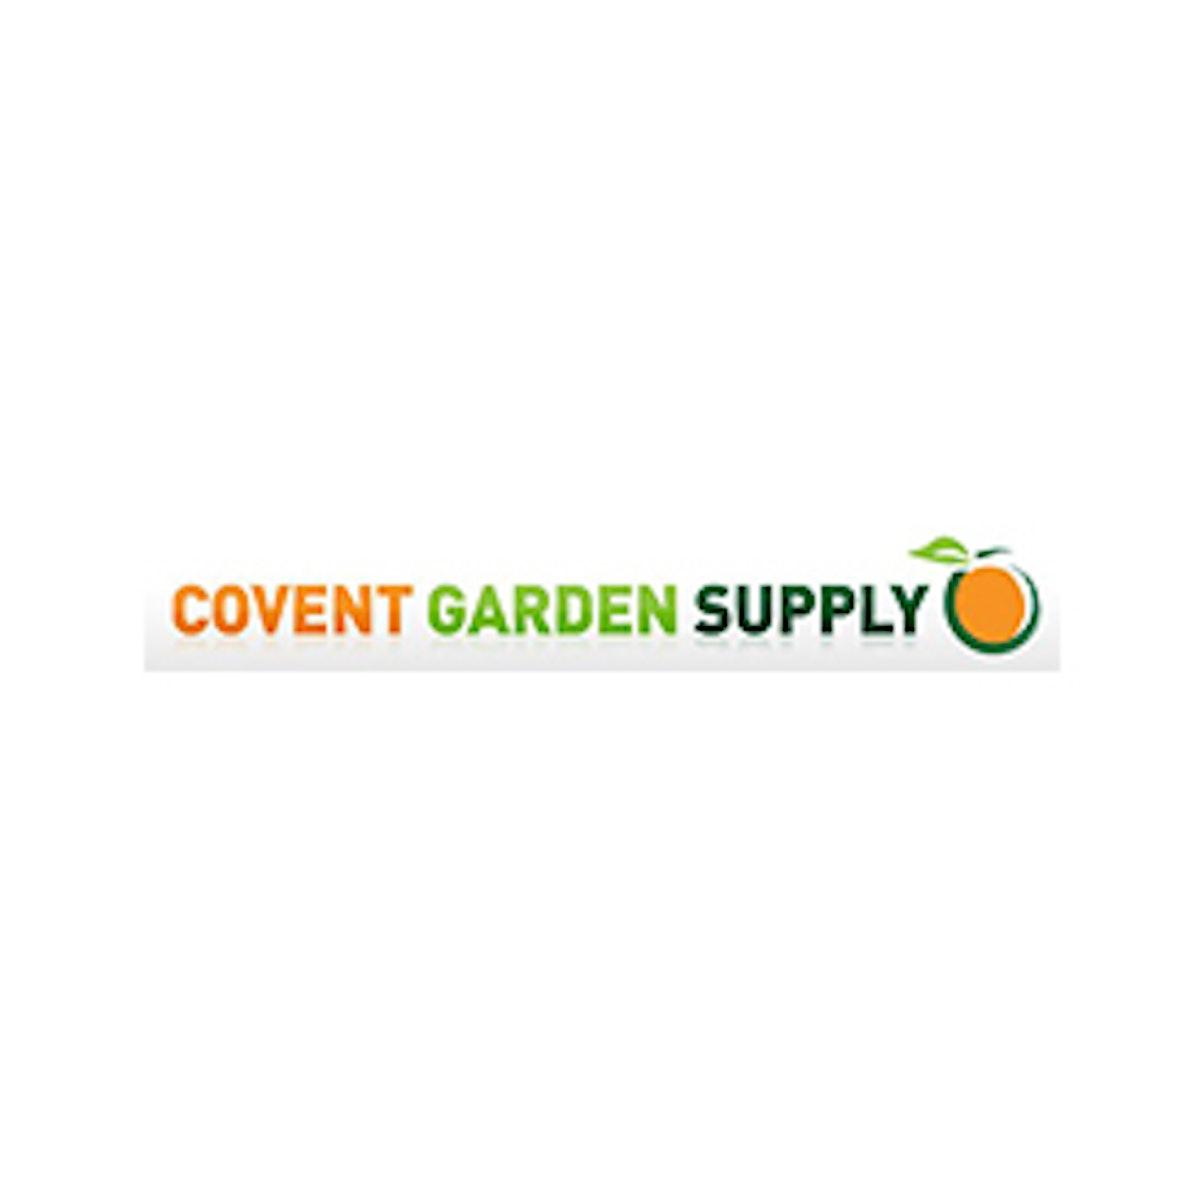 Covent Garden Supply